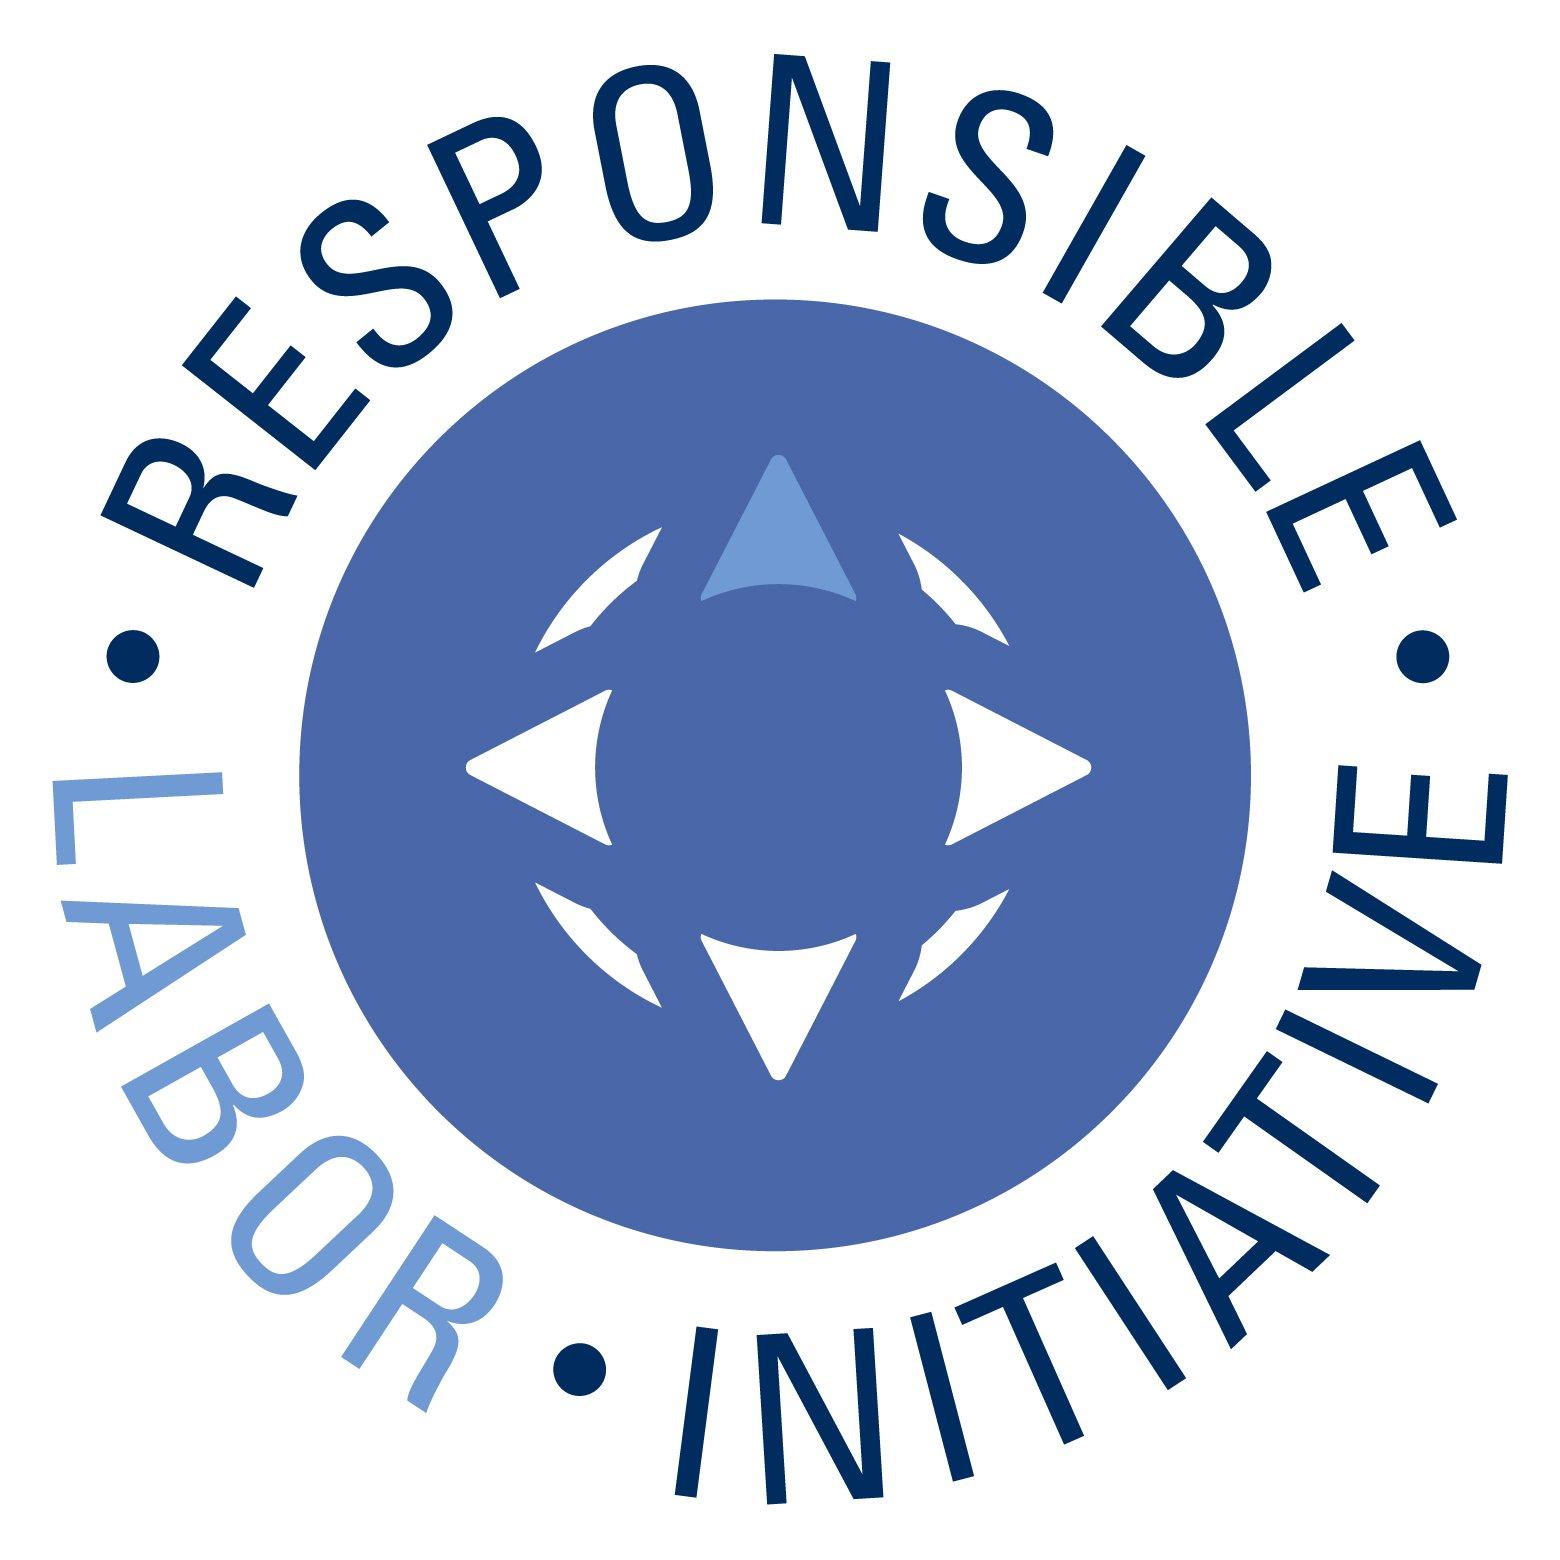 The Responsible Labor Initiative (RLI)